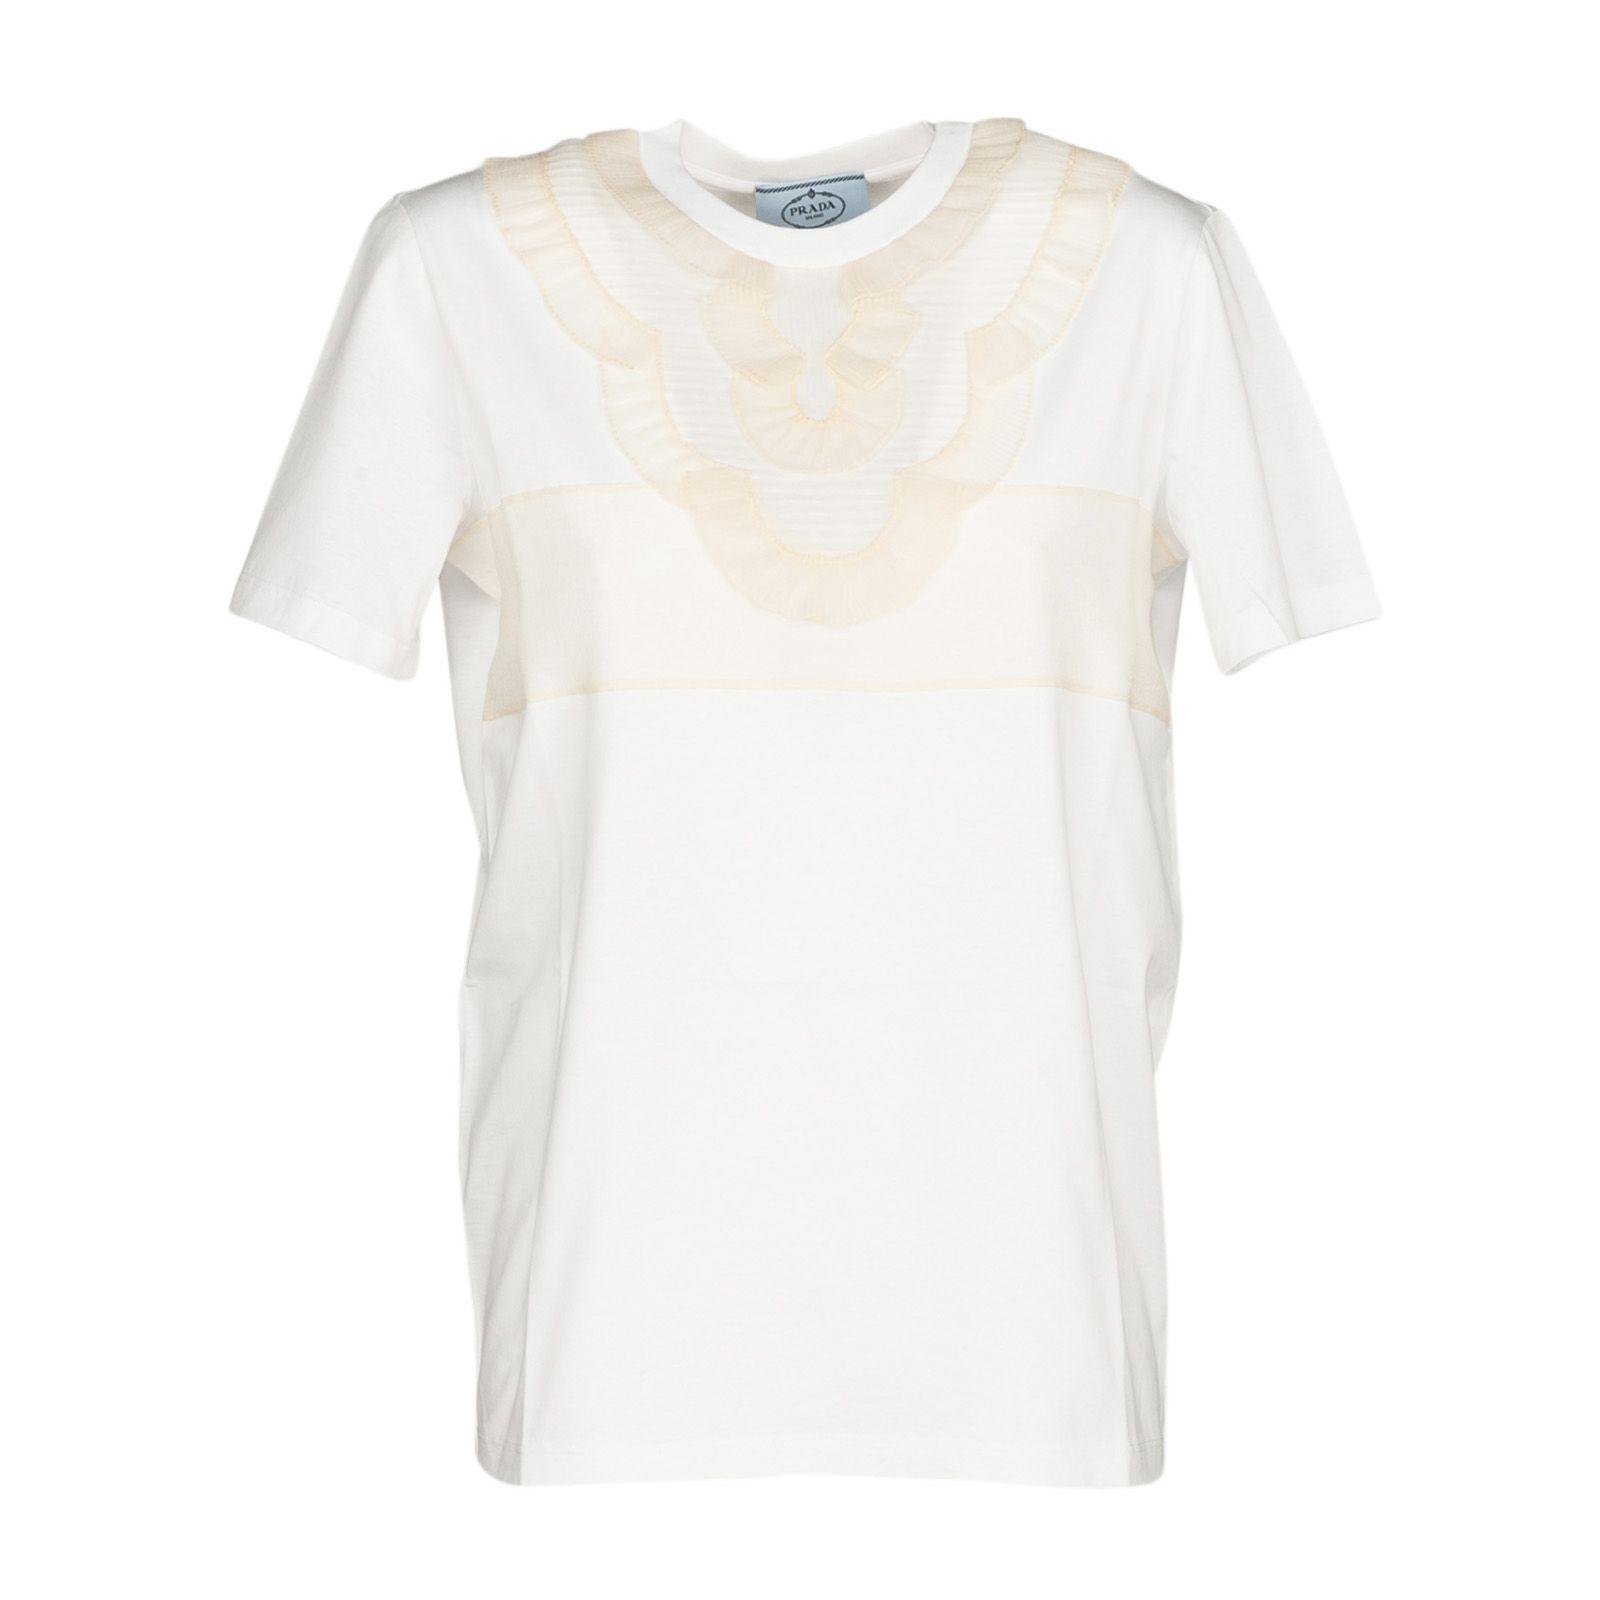 Prada Embroidered T-shirt